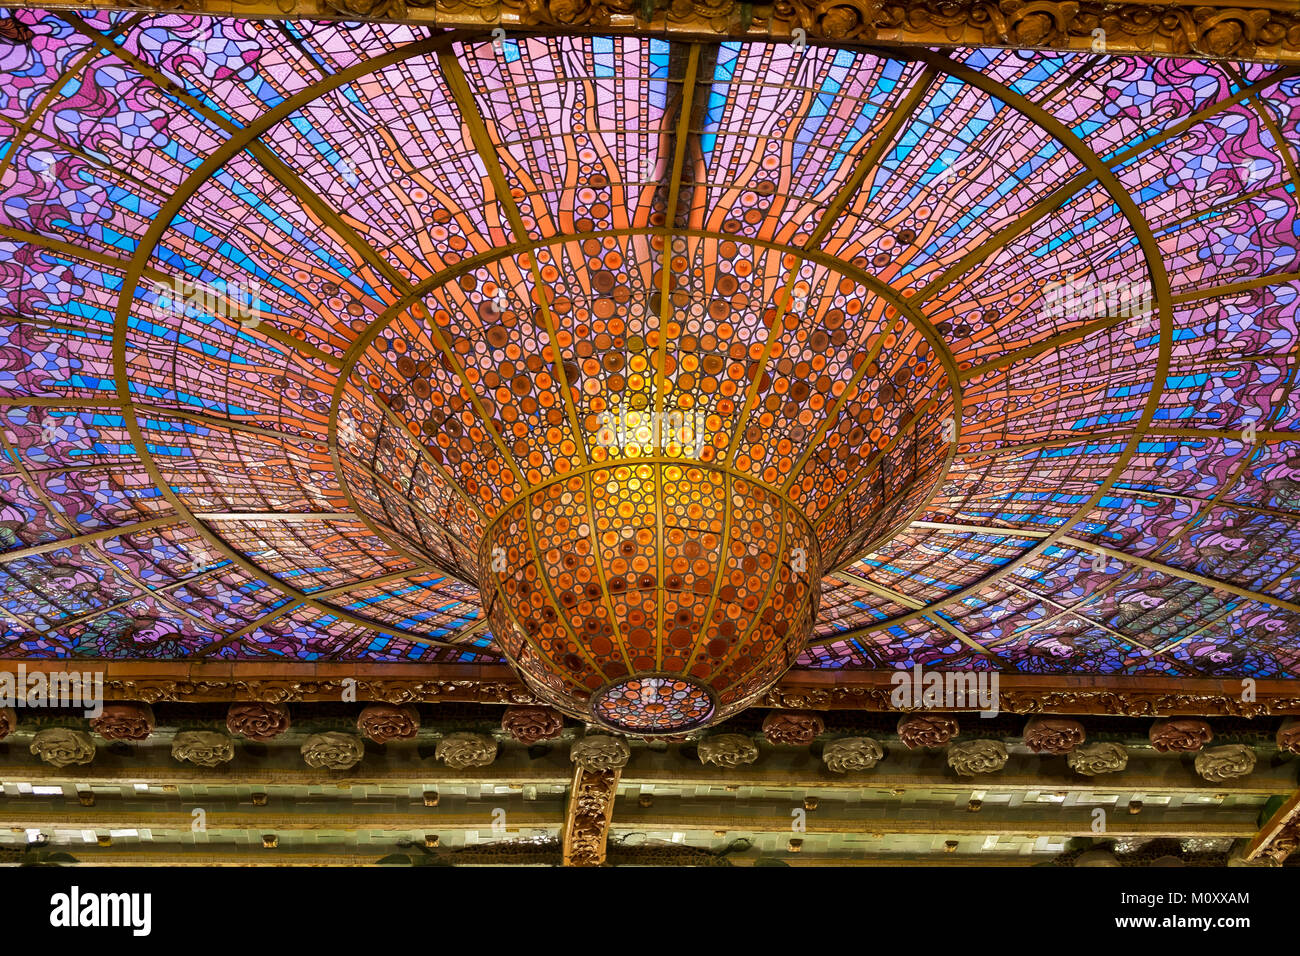 El techo del Palau de la Música Catalana Imagen De Stock